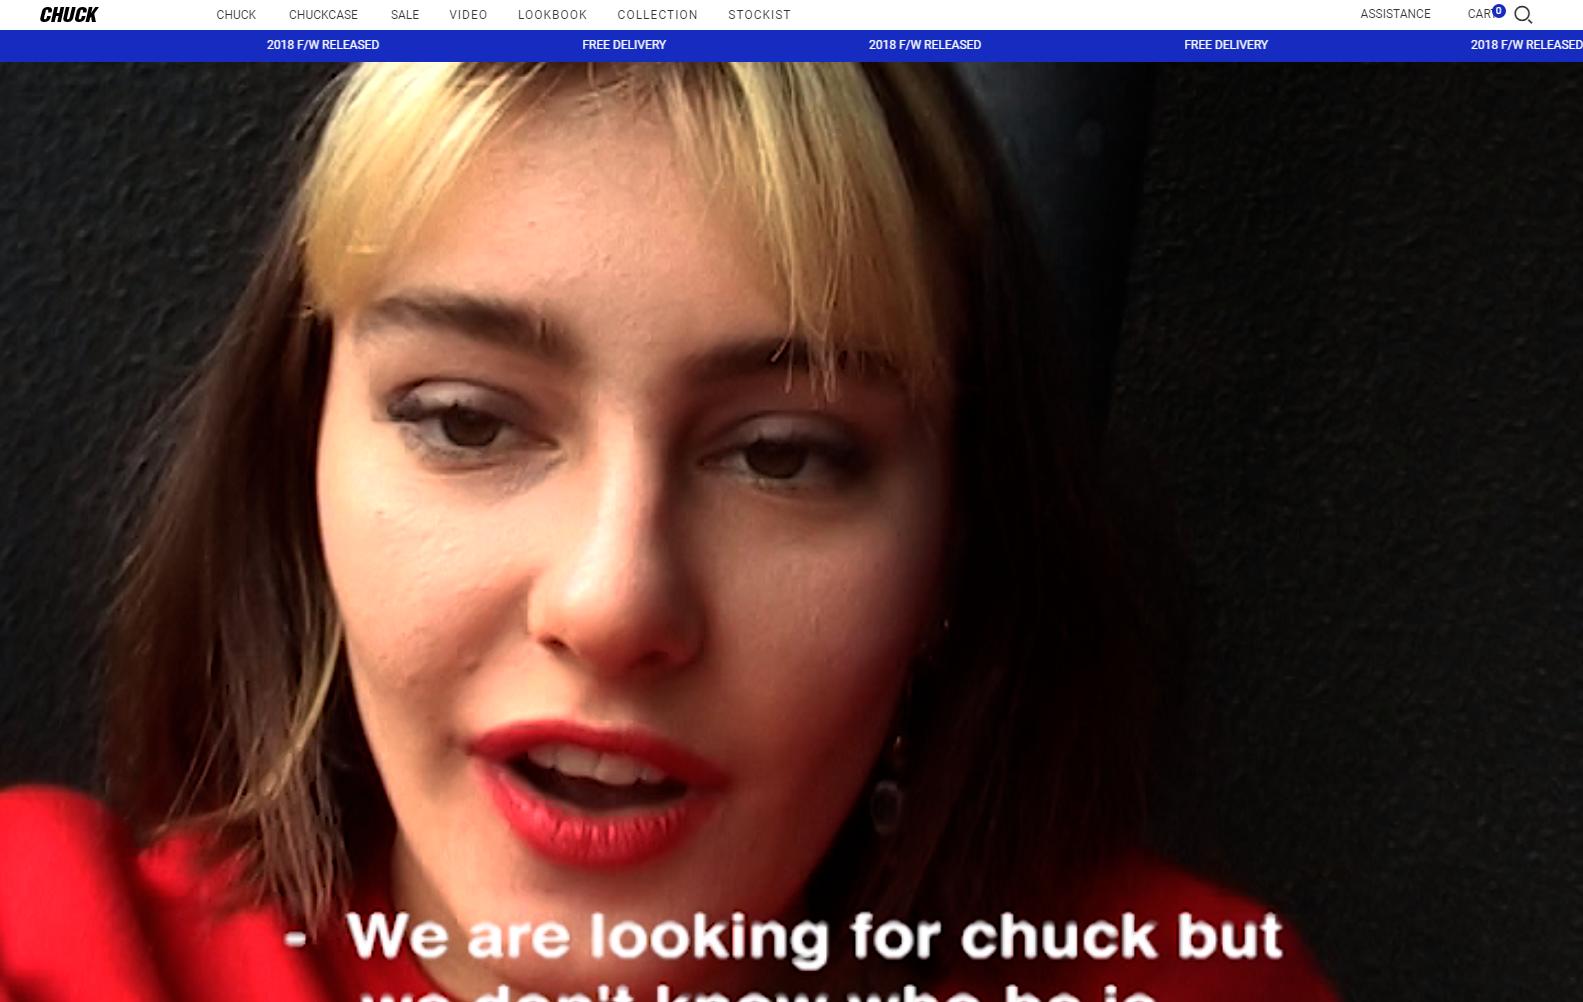 CHUCK 공식 홈페이지